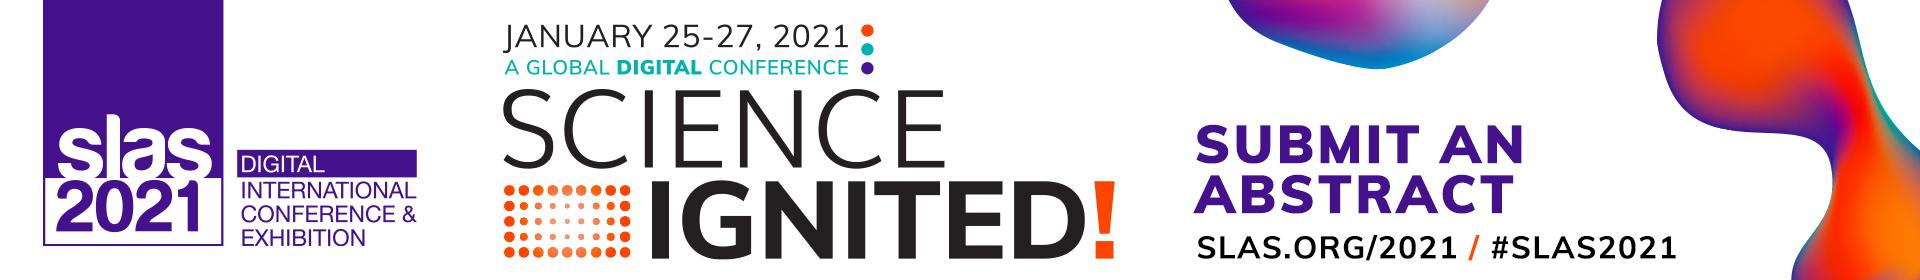 SLAS2021 Event Banner